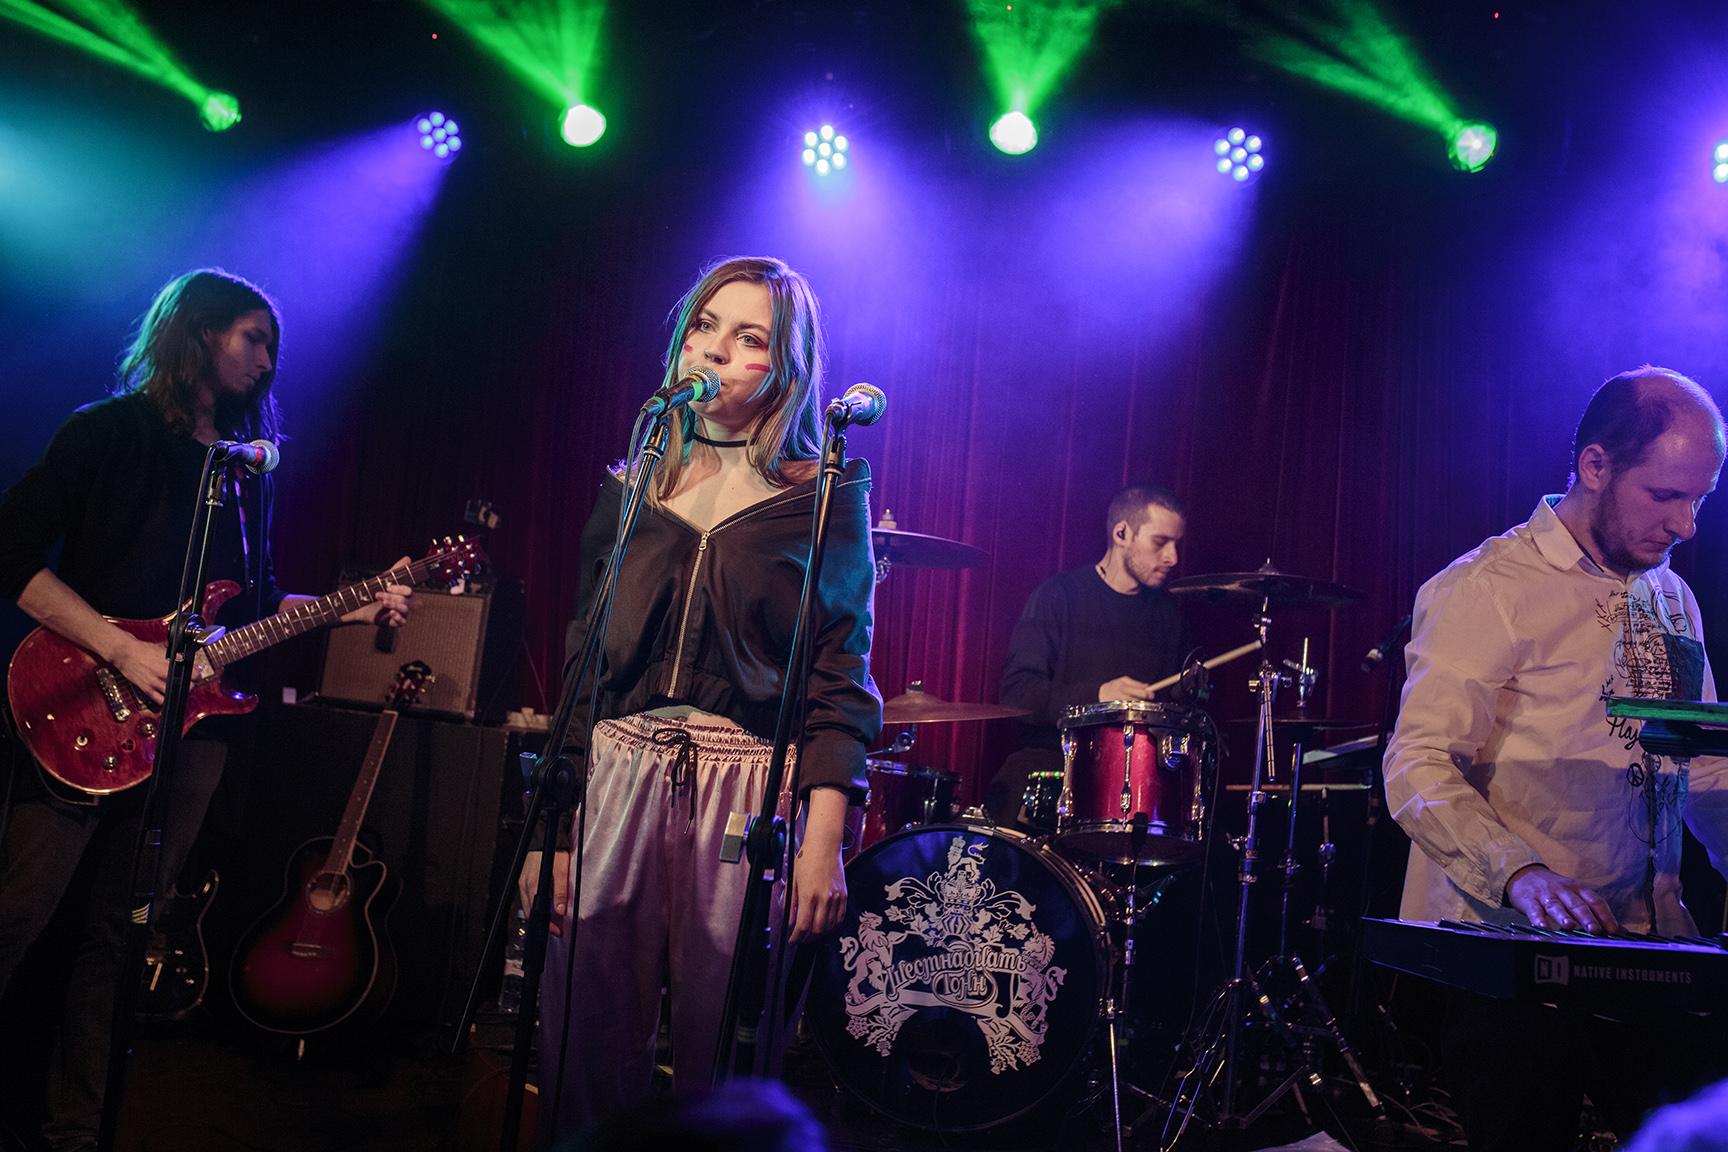 Фото Маша Hima, Живой концерт